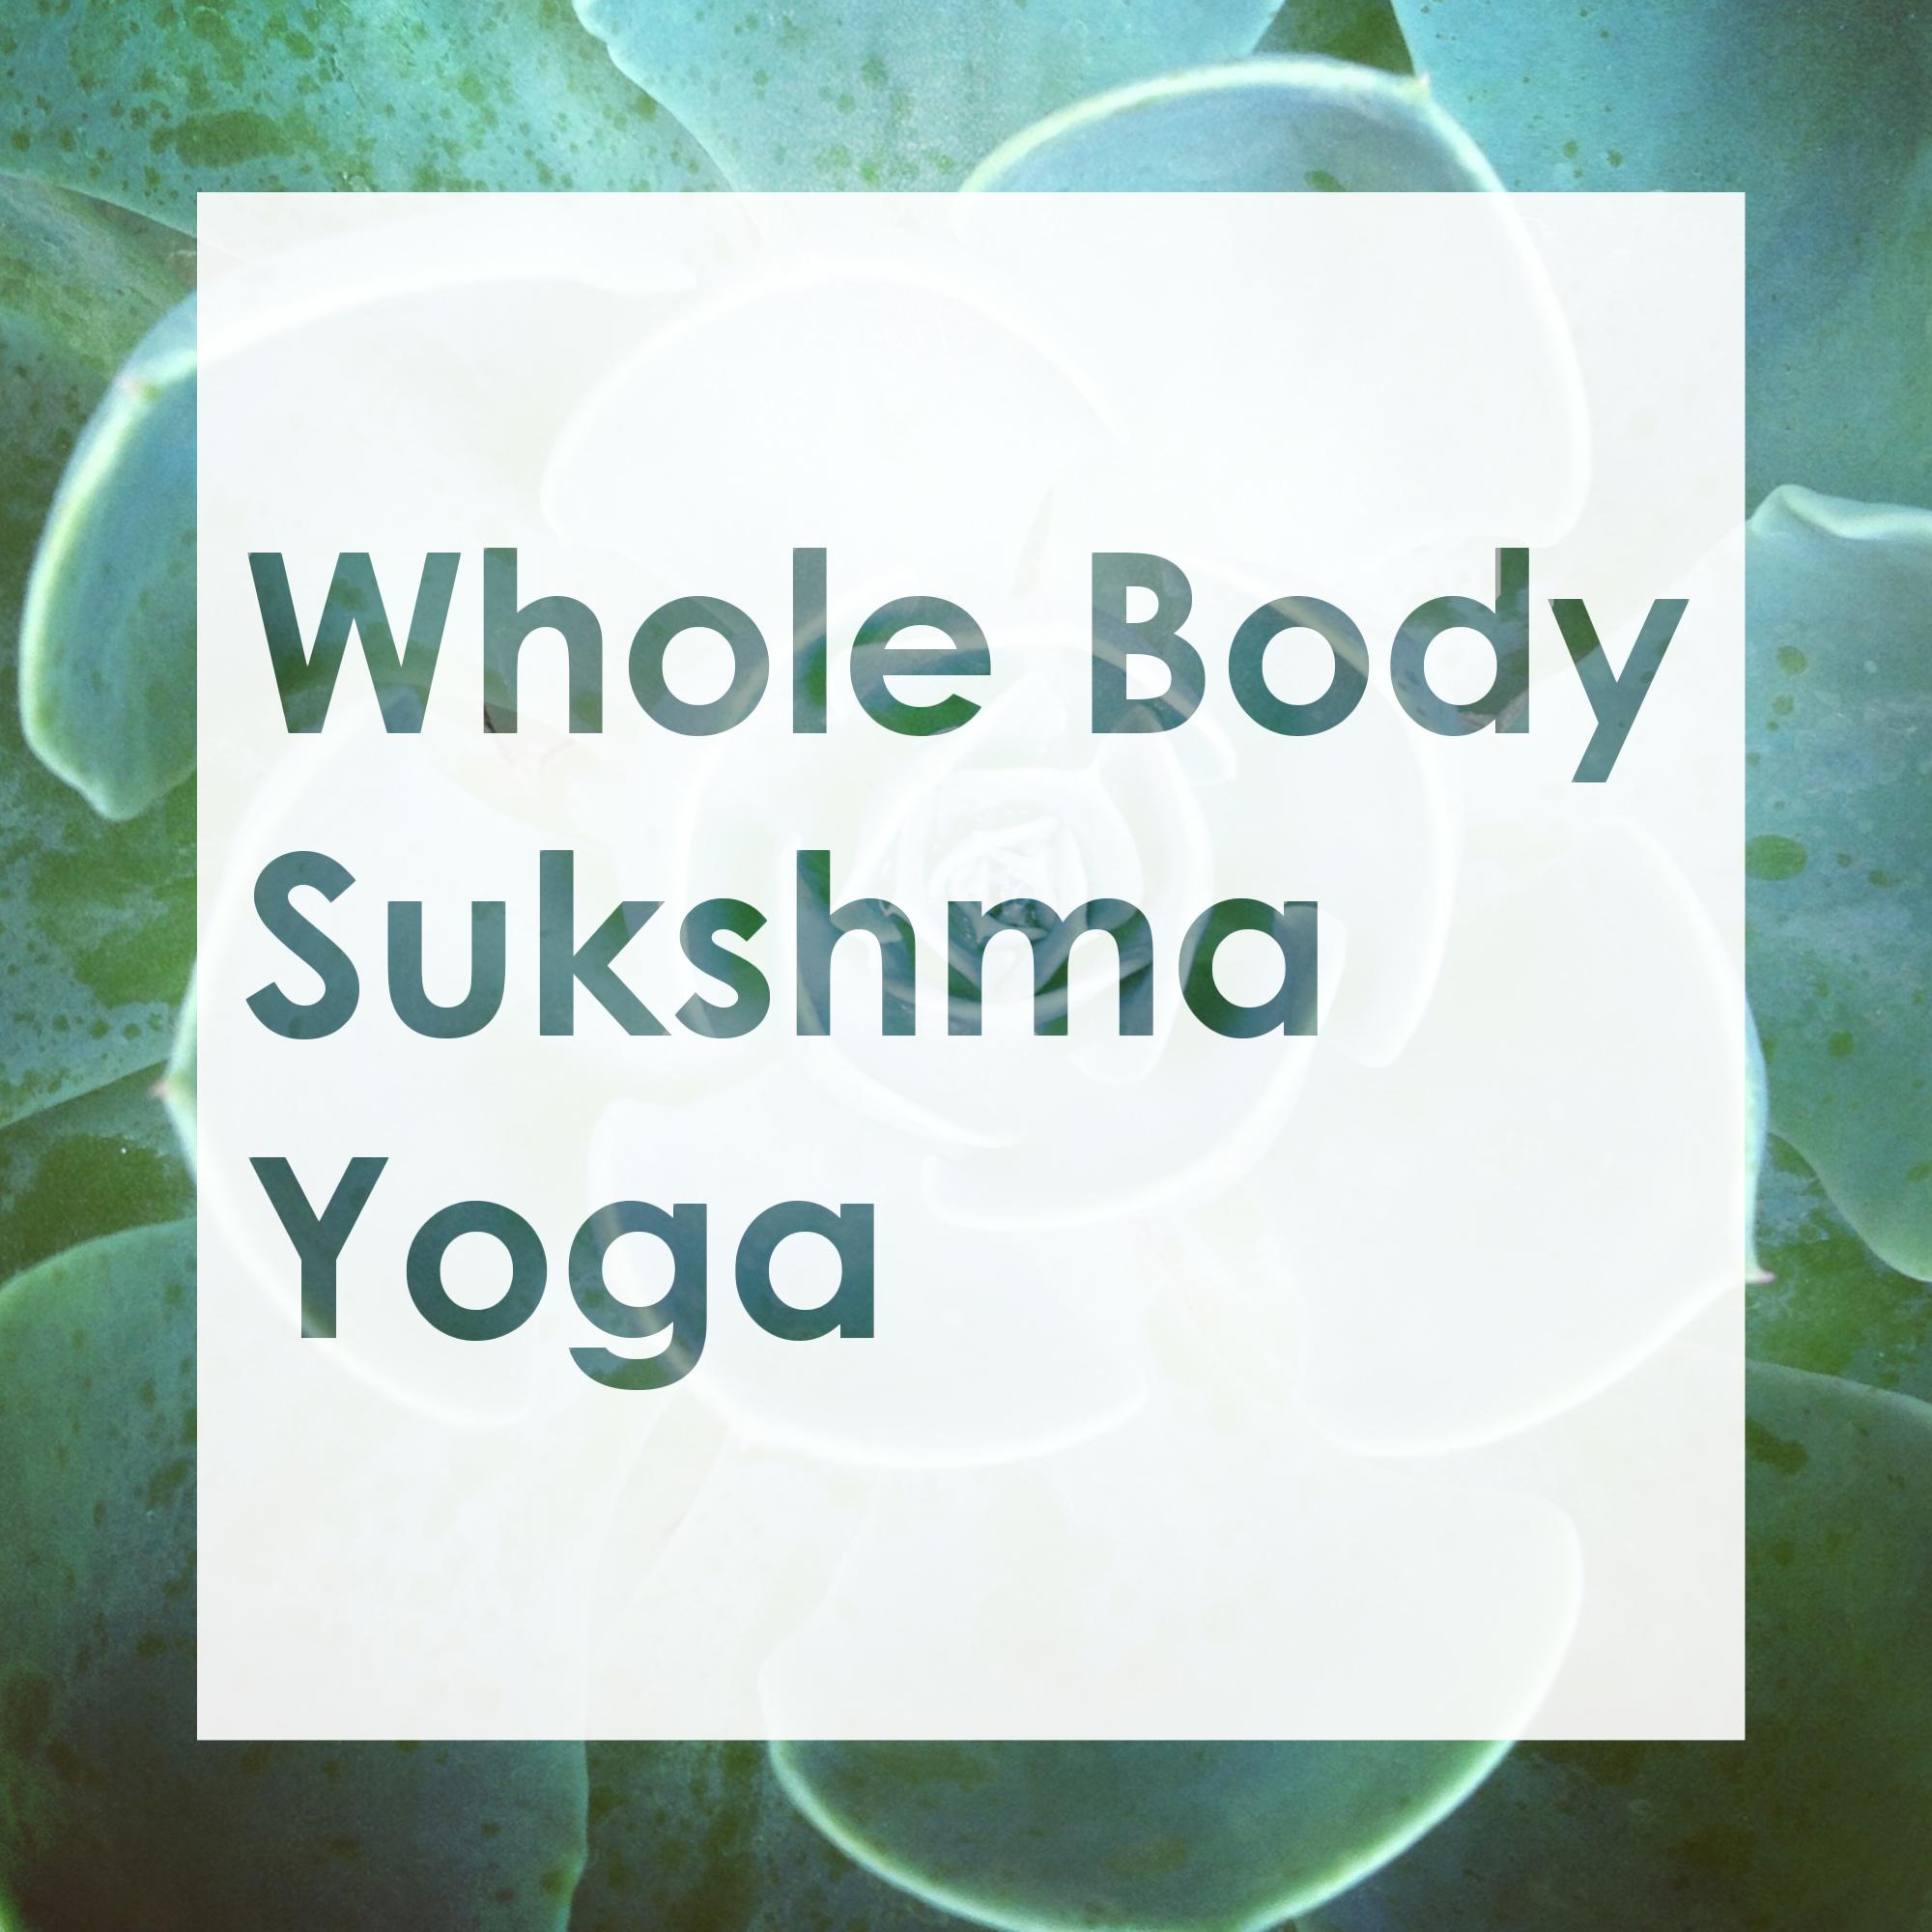 Whole Body Sukshma Yoga